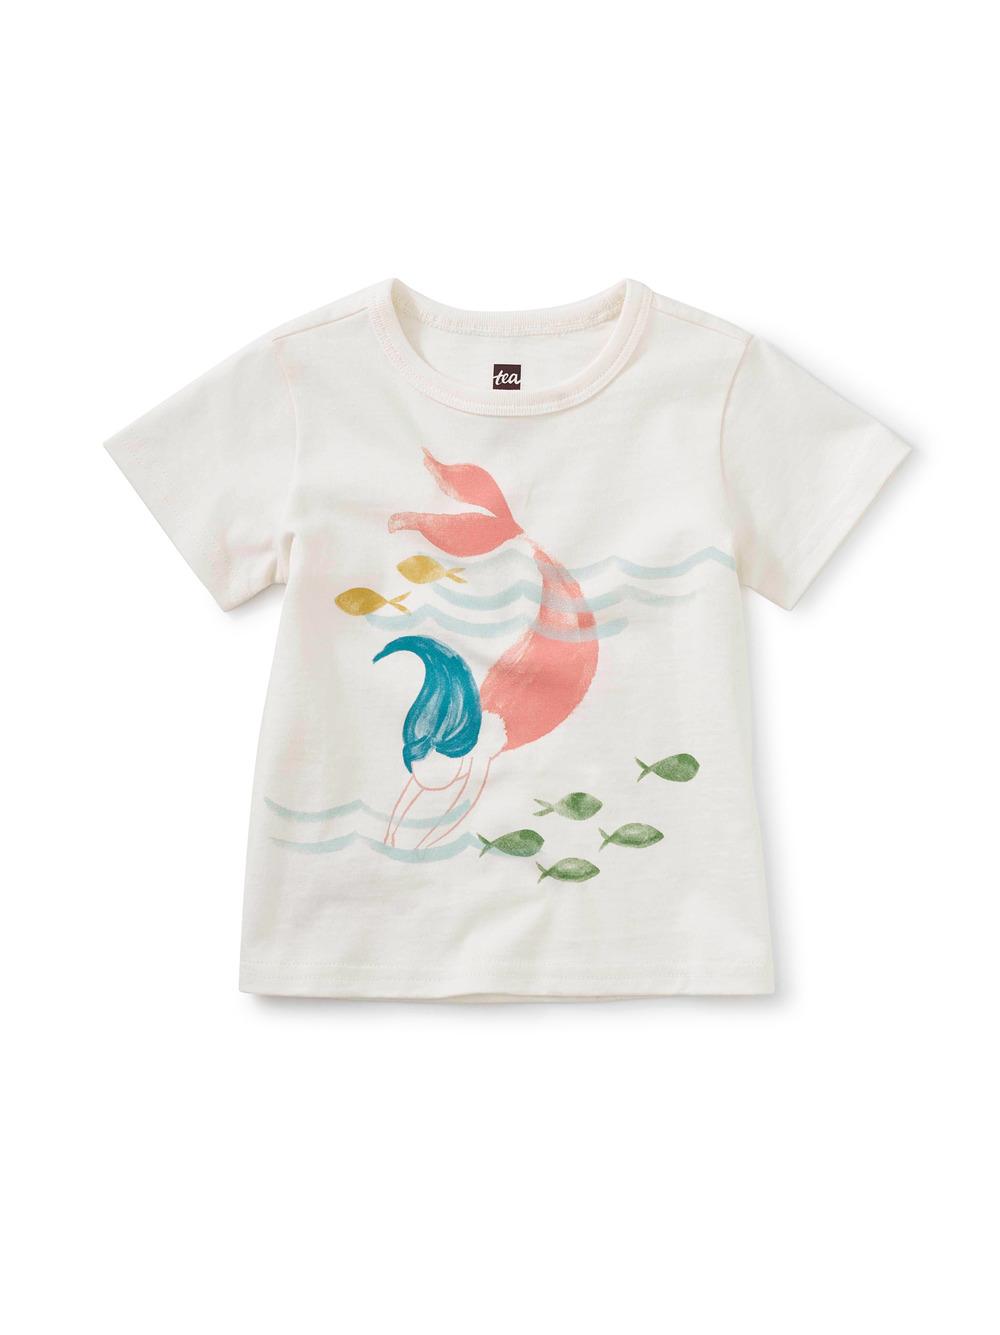 Diving Mermaid Baby Graphic Tee